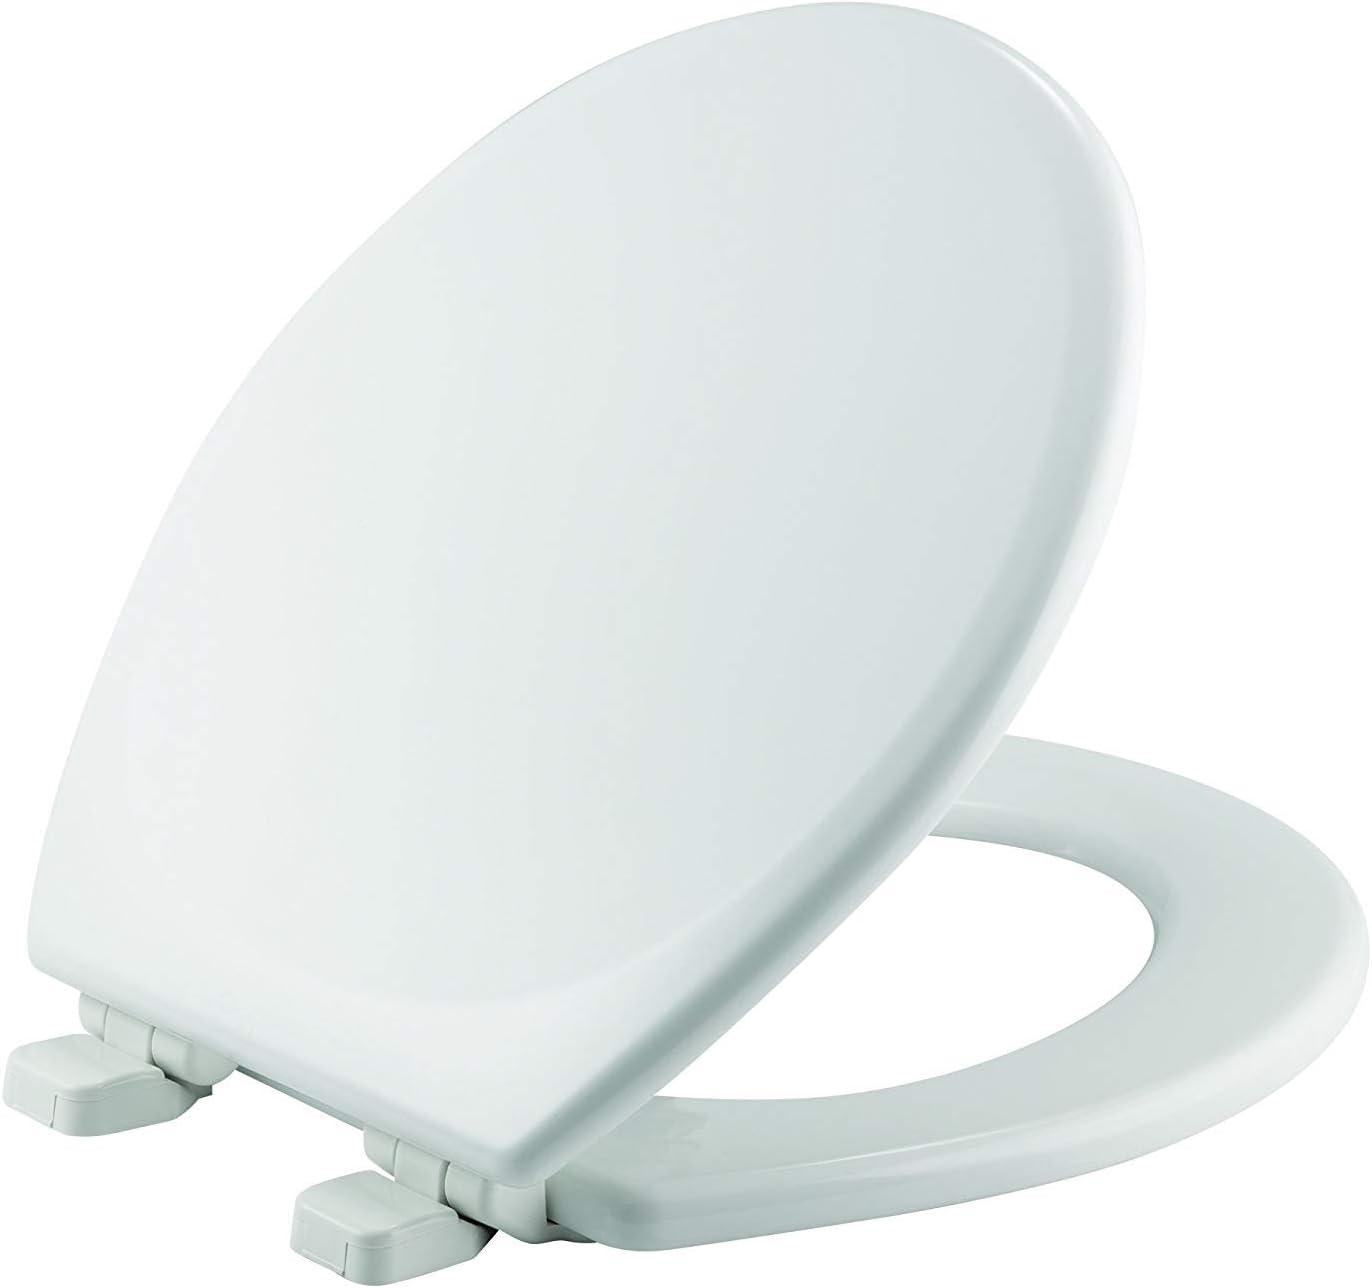 Best Toilet Seat-Best Wood: Mayfair Featuring 43SLOW Toilet Seat